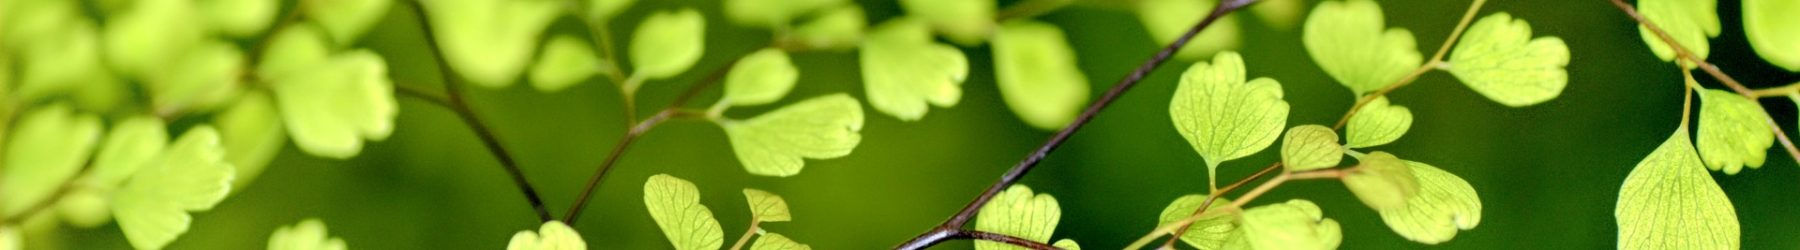 johanna jalbert naturopathe grenoble reflexologie santé naturelle